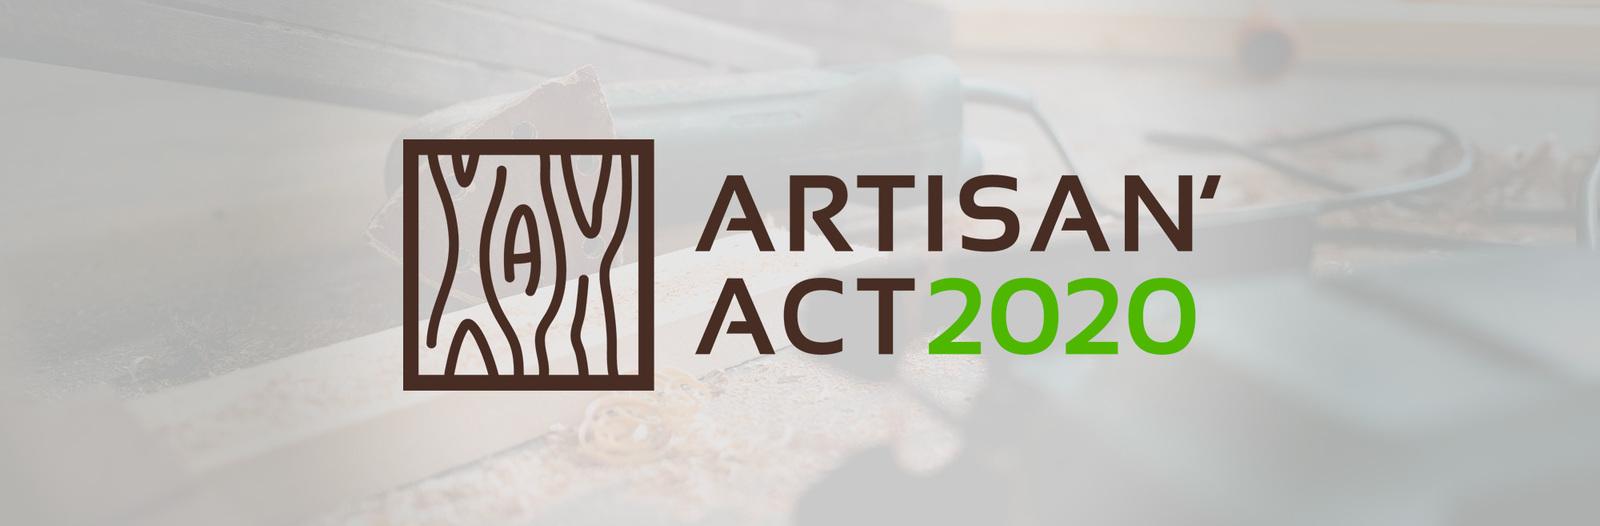 artisan-act-2021